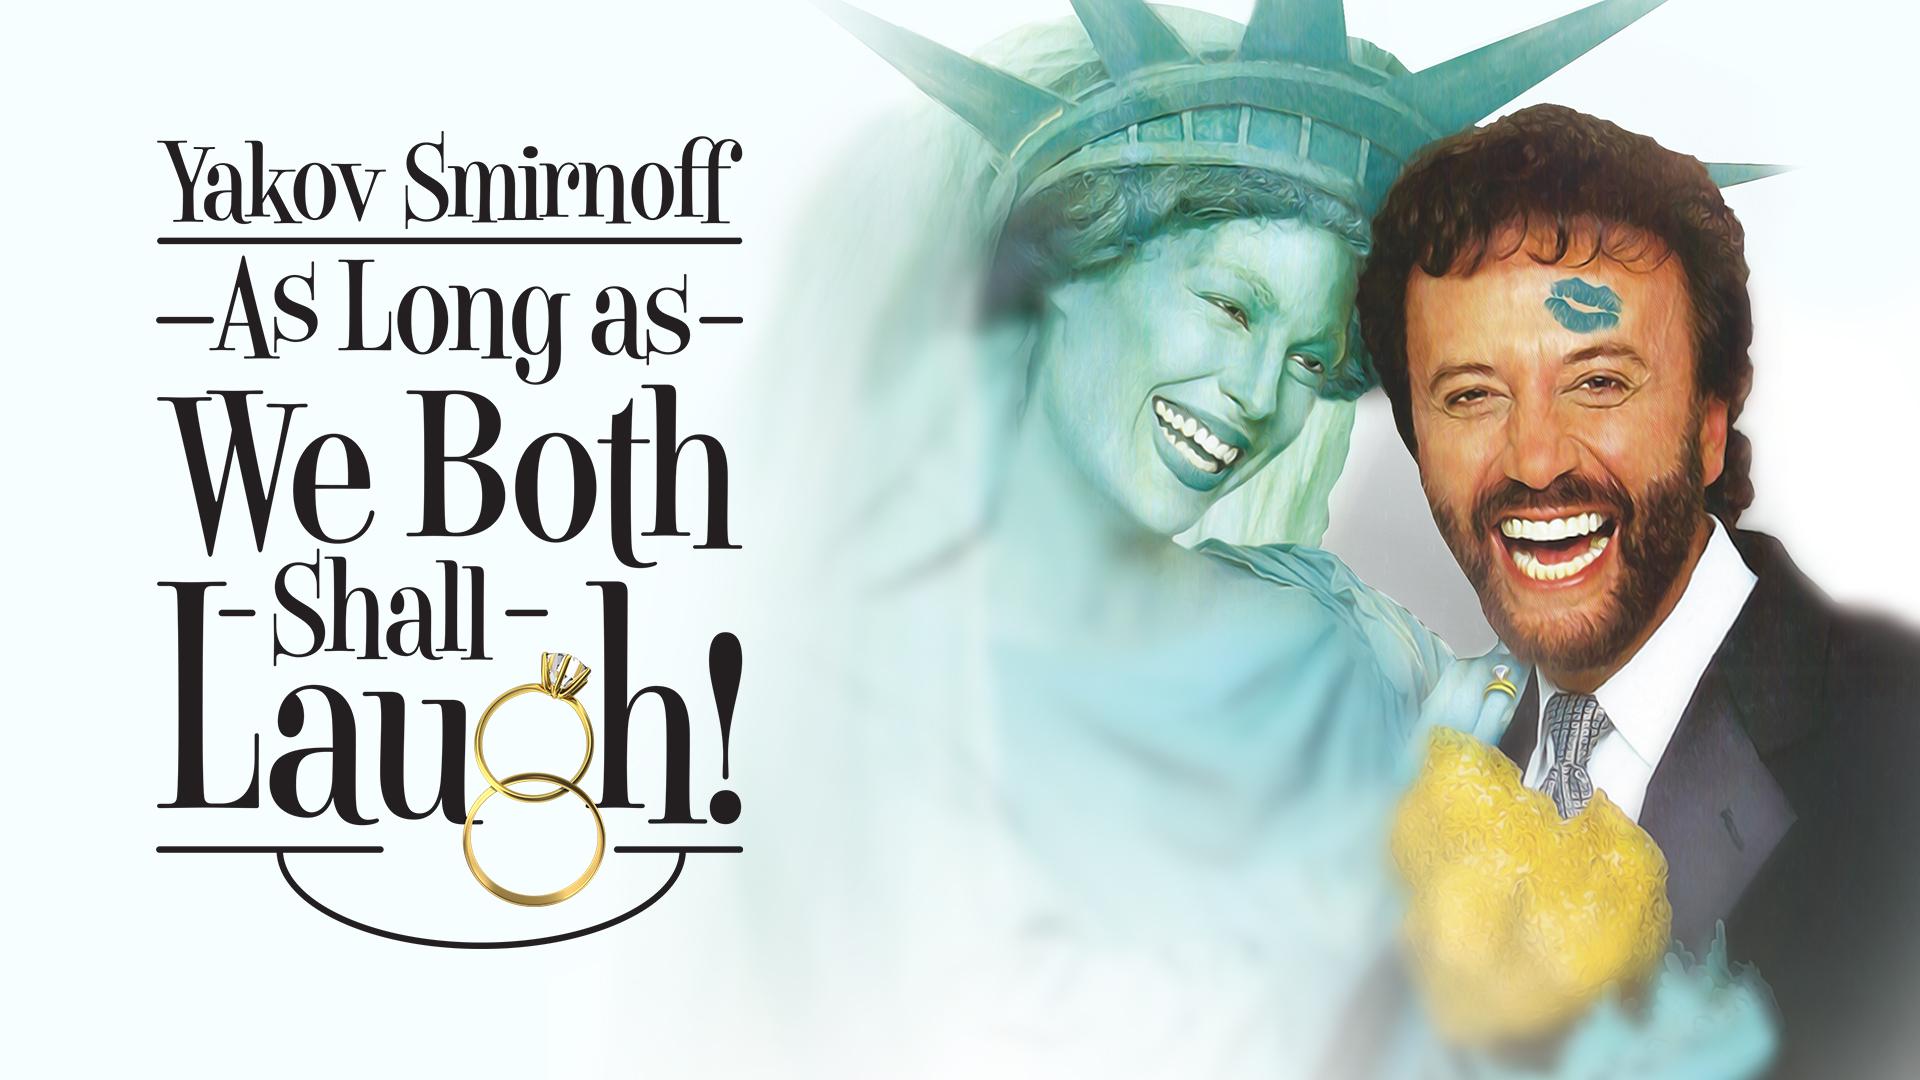 Yakov Smirnoff: As Long As We Both Shall Laugh